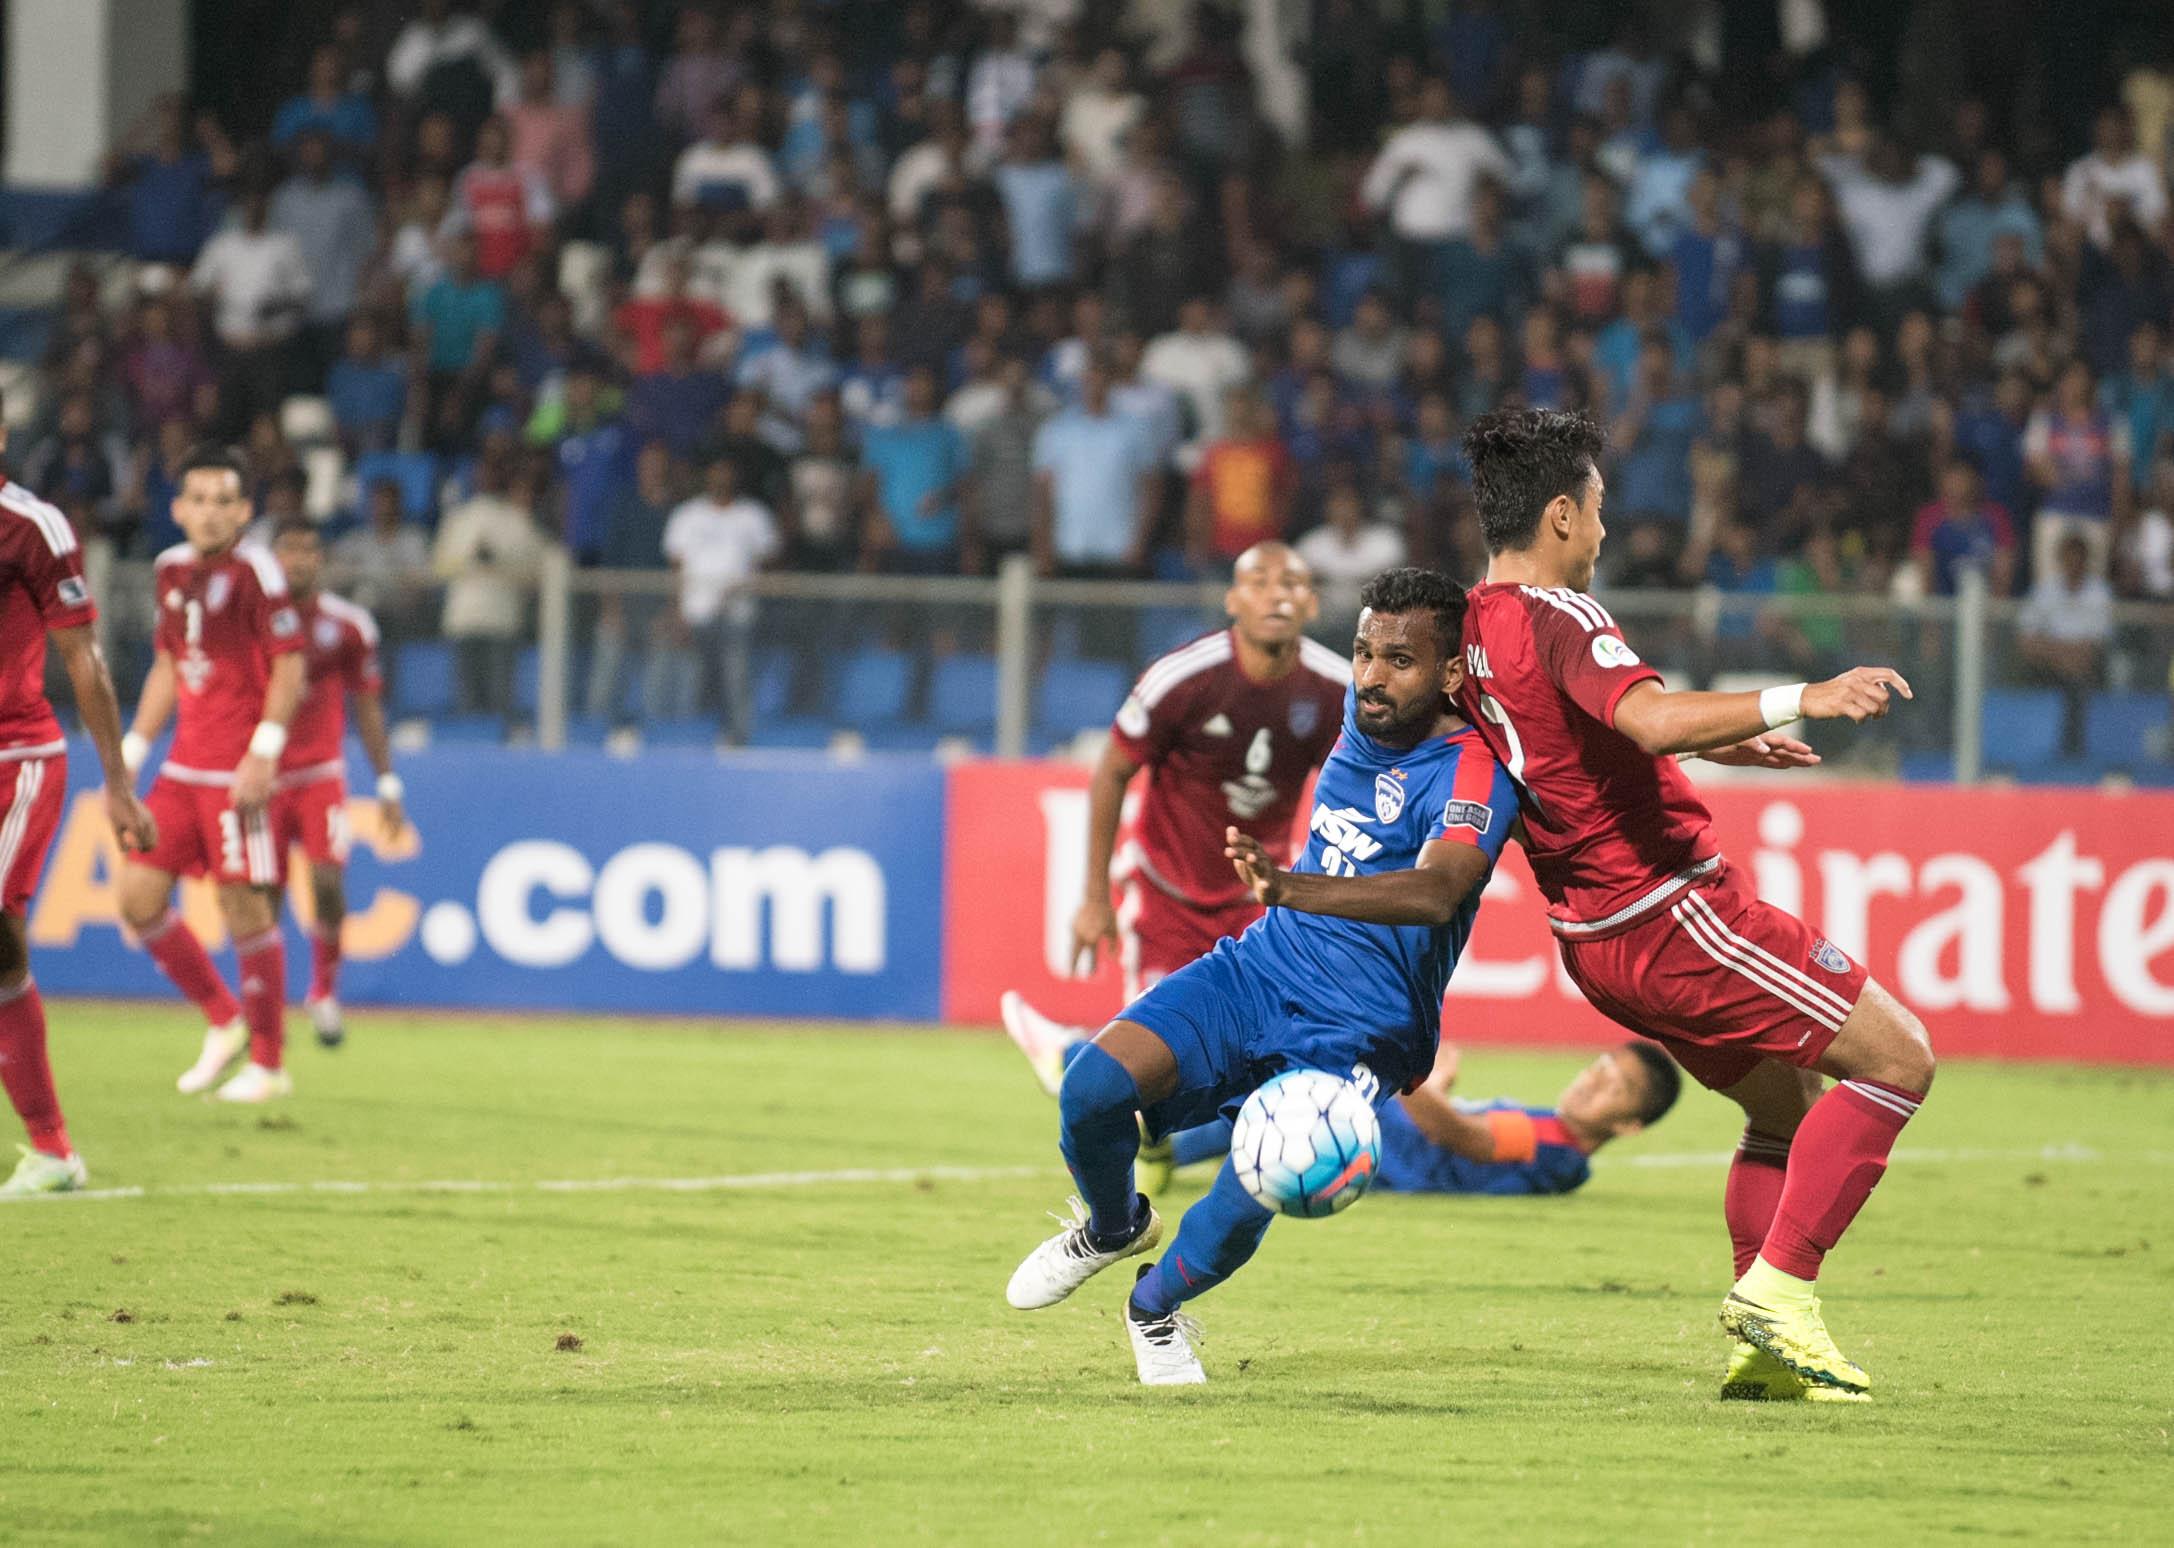 Bengaluru FC, CK Vineeth, Football, Bengaluru, Bangalore, Bengaluru FC, Indian Football, AFC Cup, Johor Darul Taksim, Malaysia